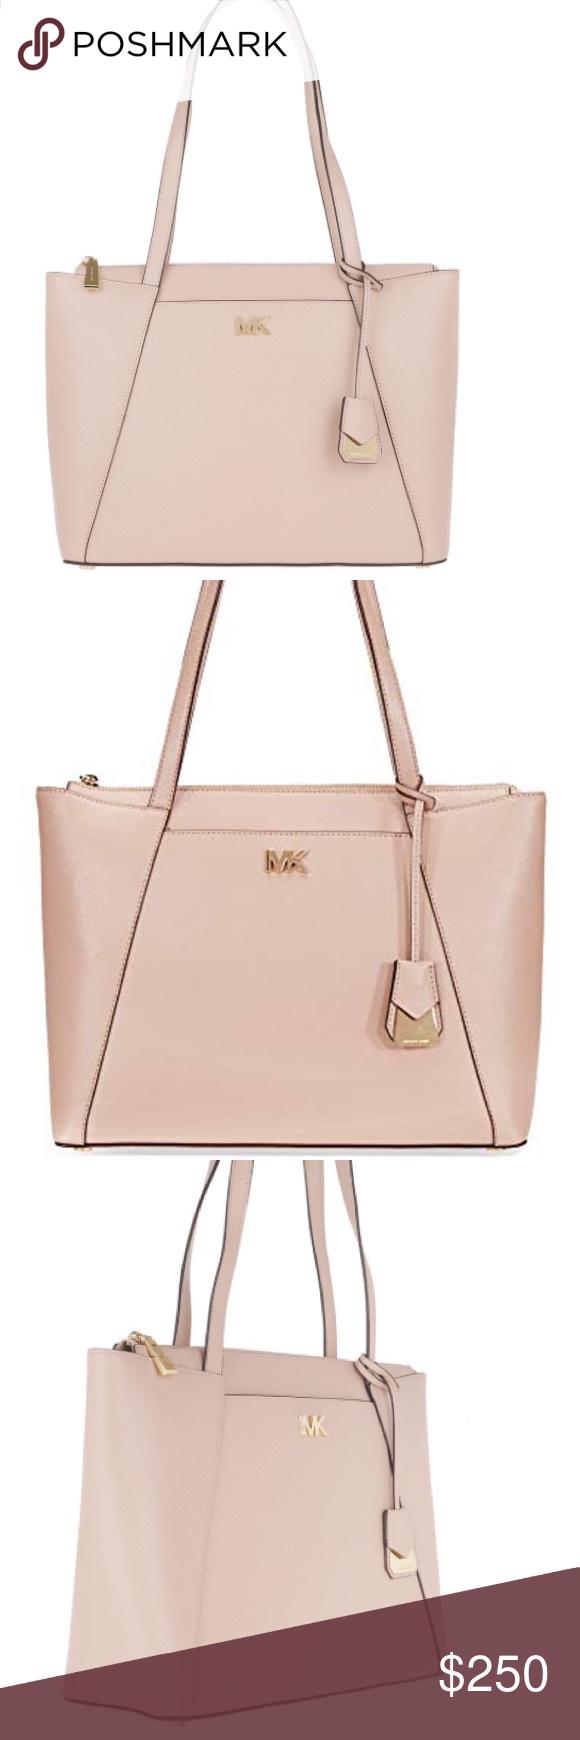 d8f5f69ff319 Michael Kors Maddie Soft pink tote. Michael Kors Maddie Medium Crossgrain  Leather Tote in Soft Pink. Michael Kors Bags Totes